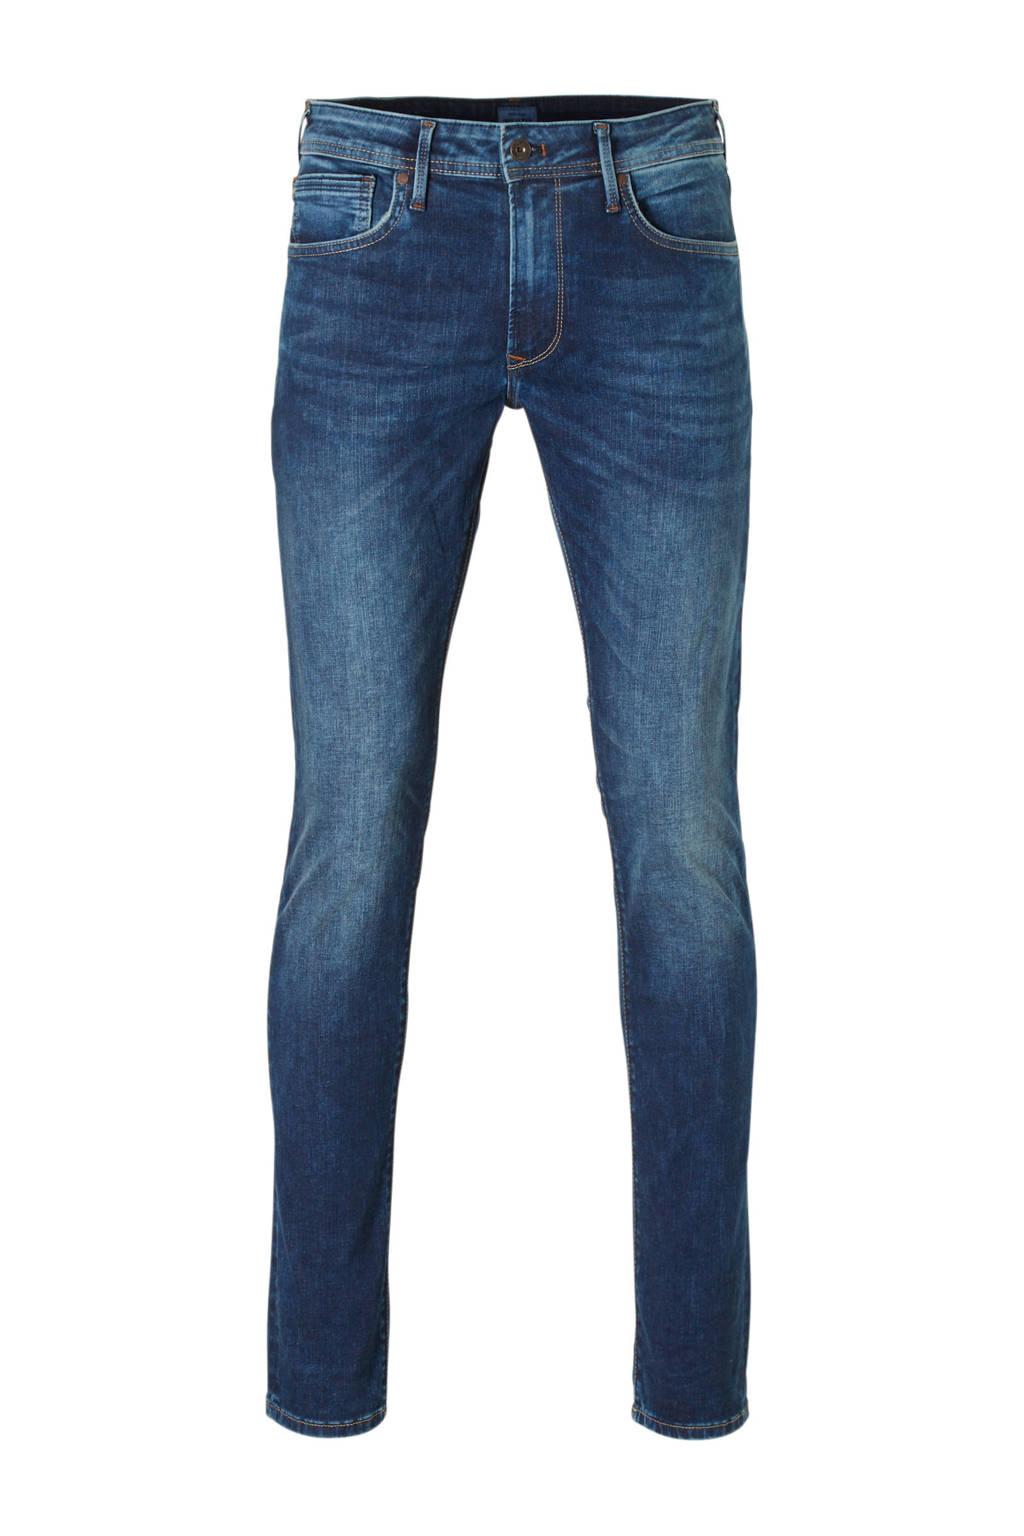 Pepe Jeans tapered fit jeans Stanley, Dark denim